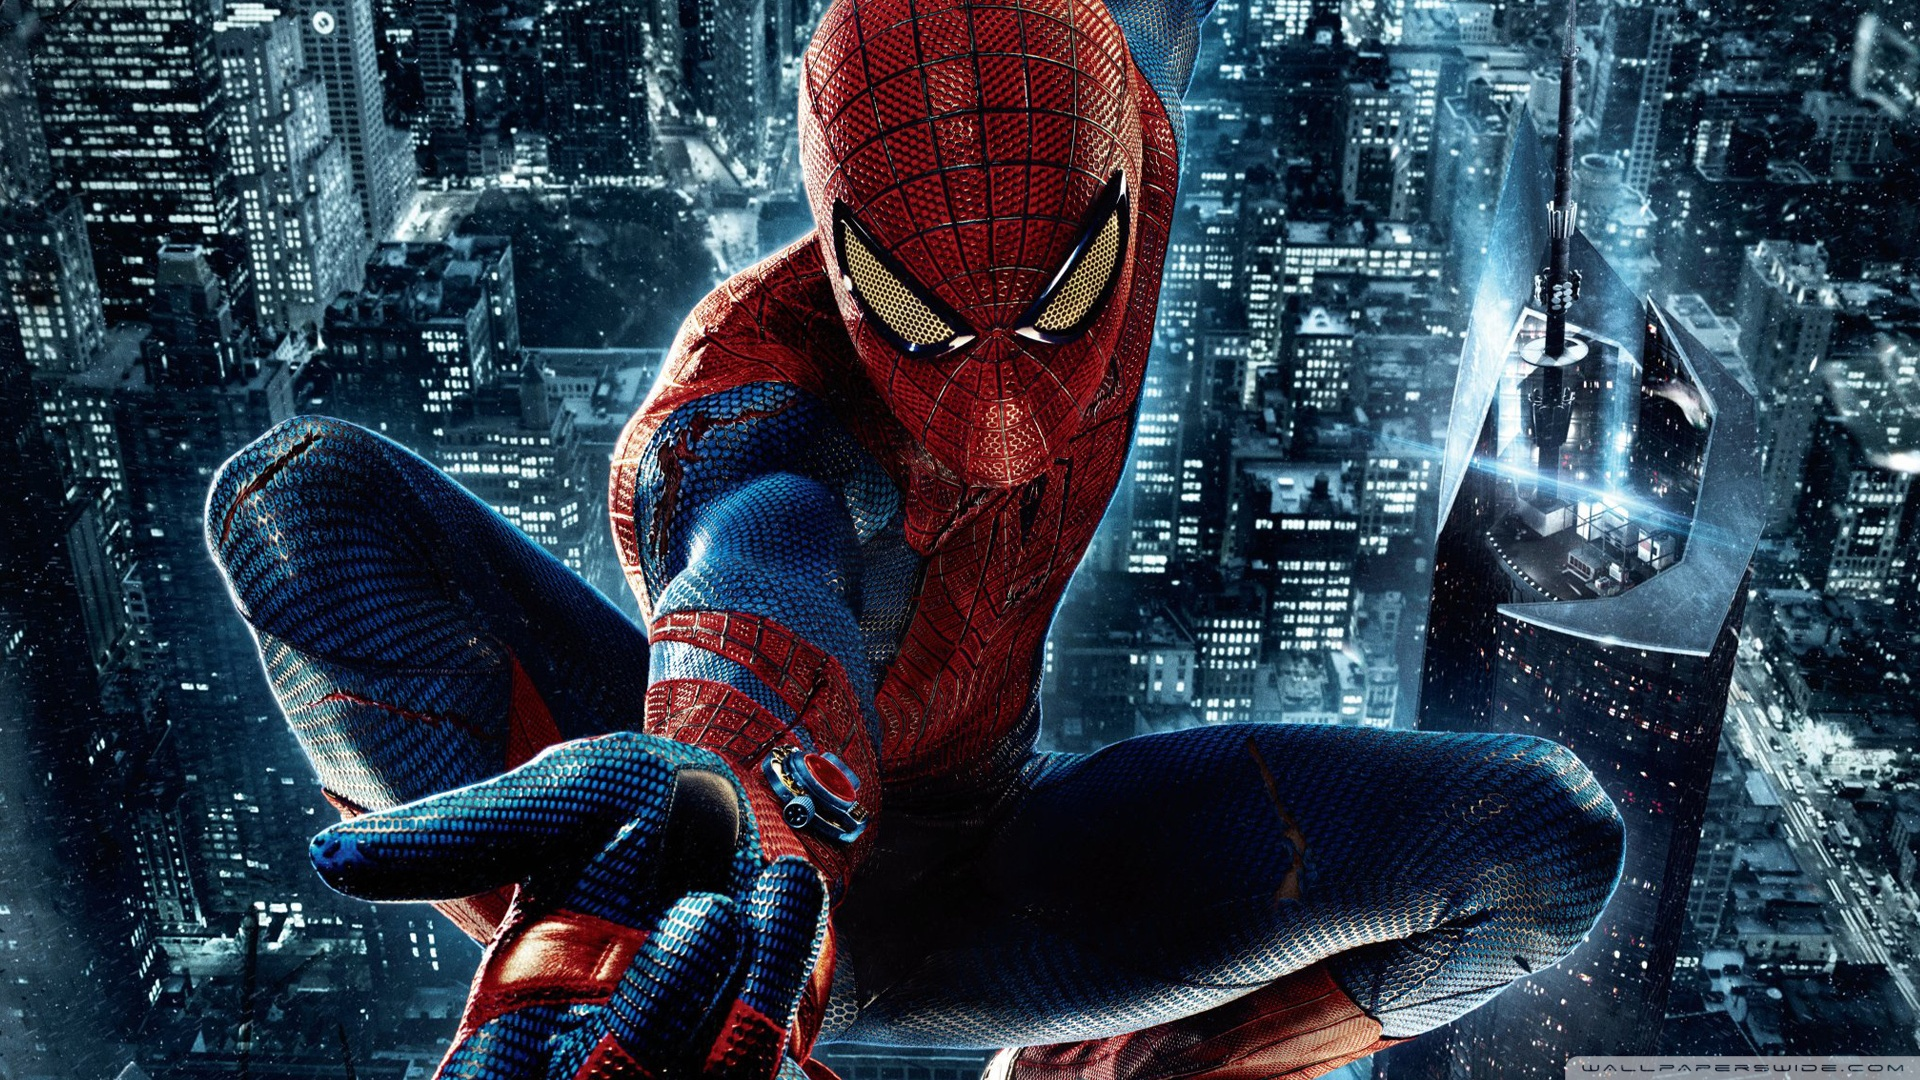 Amazing Siderman Marvel Live Action 映画 壁紙 ファンポップ